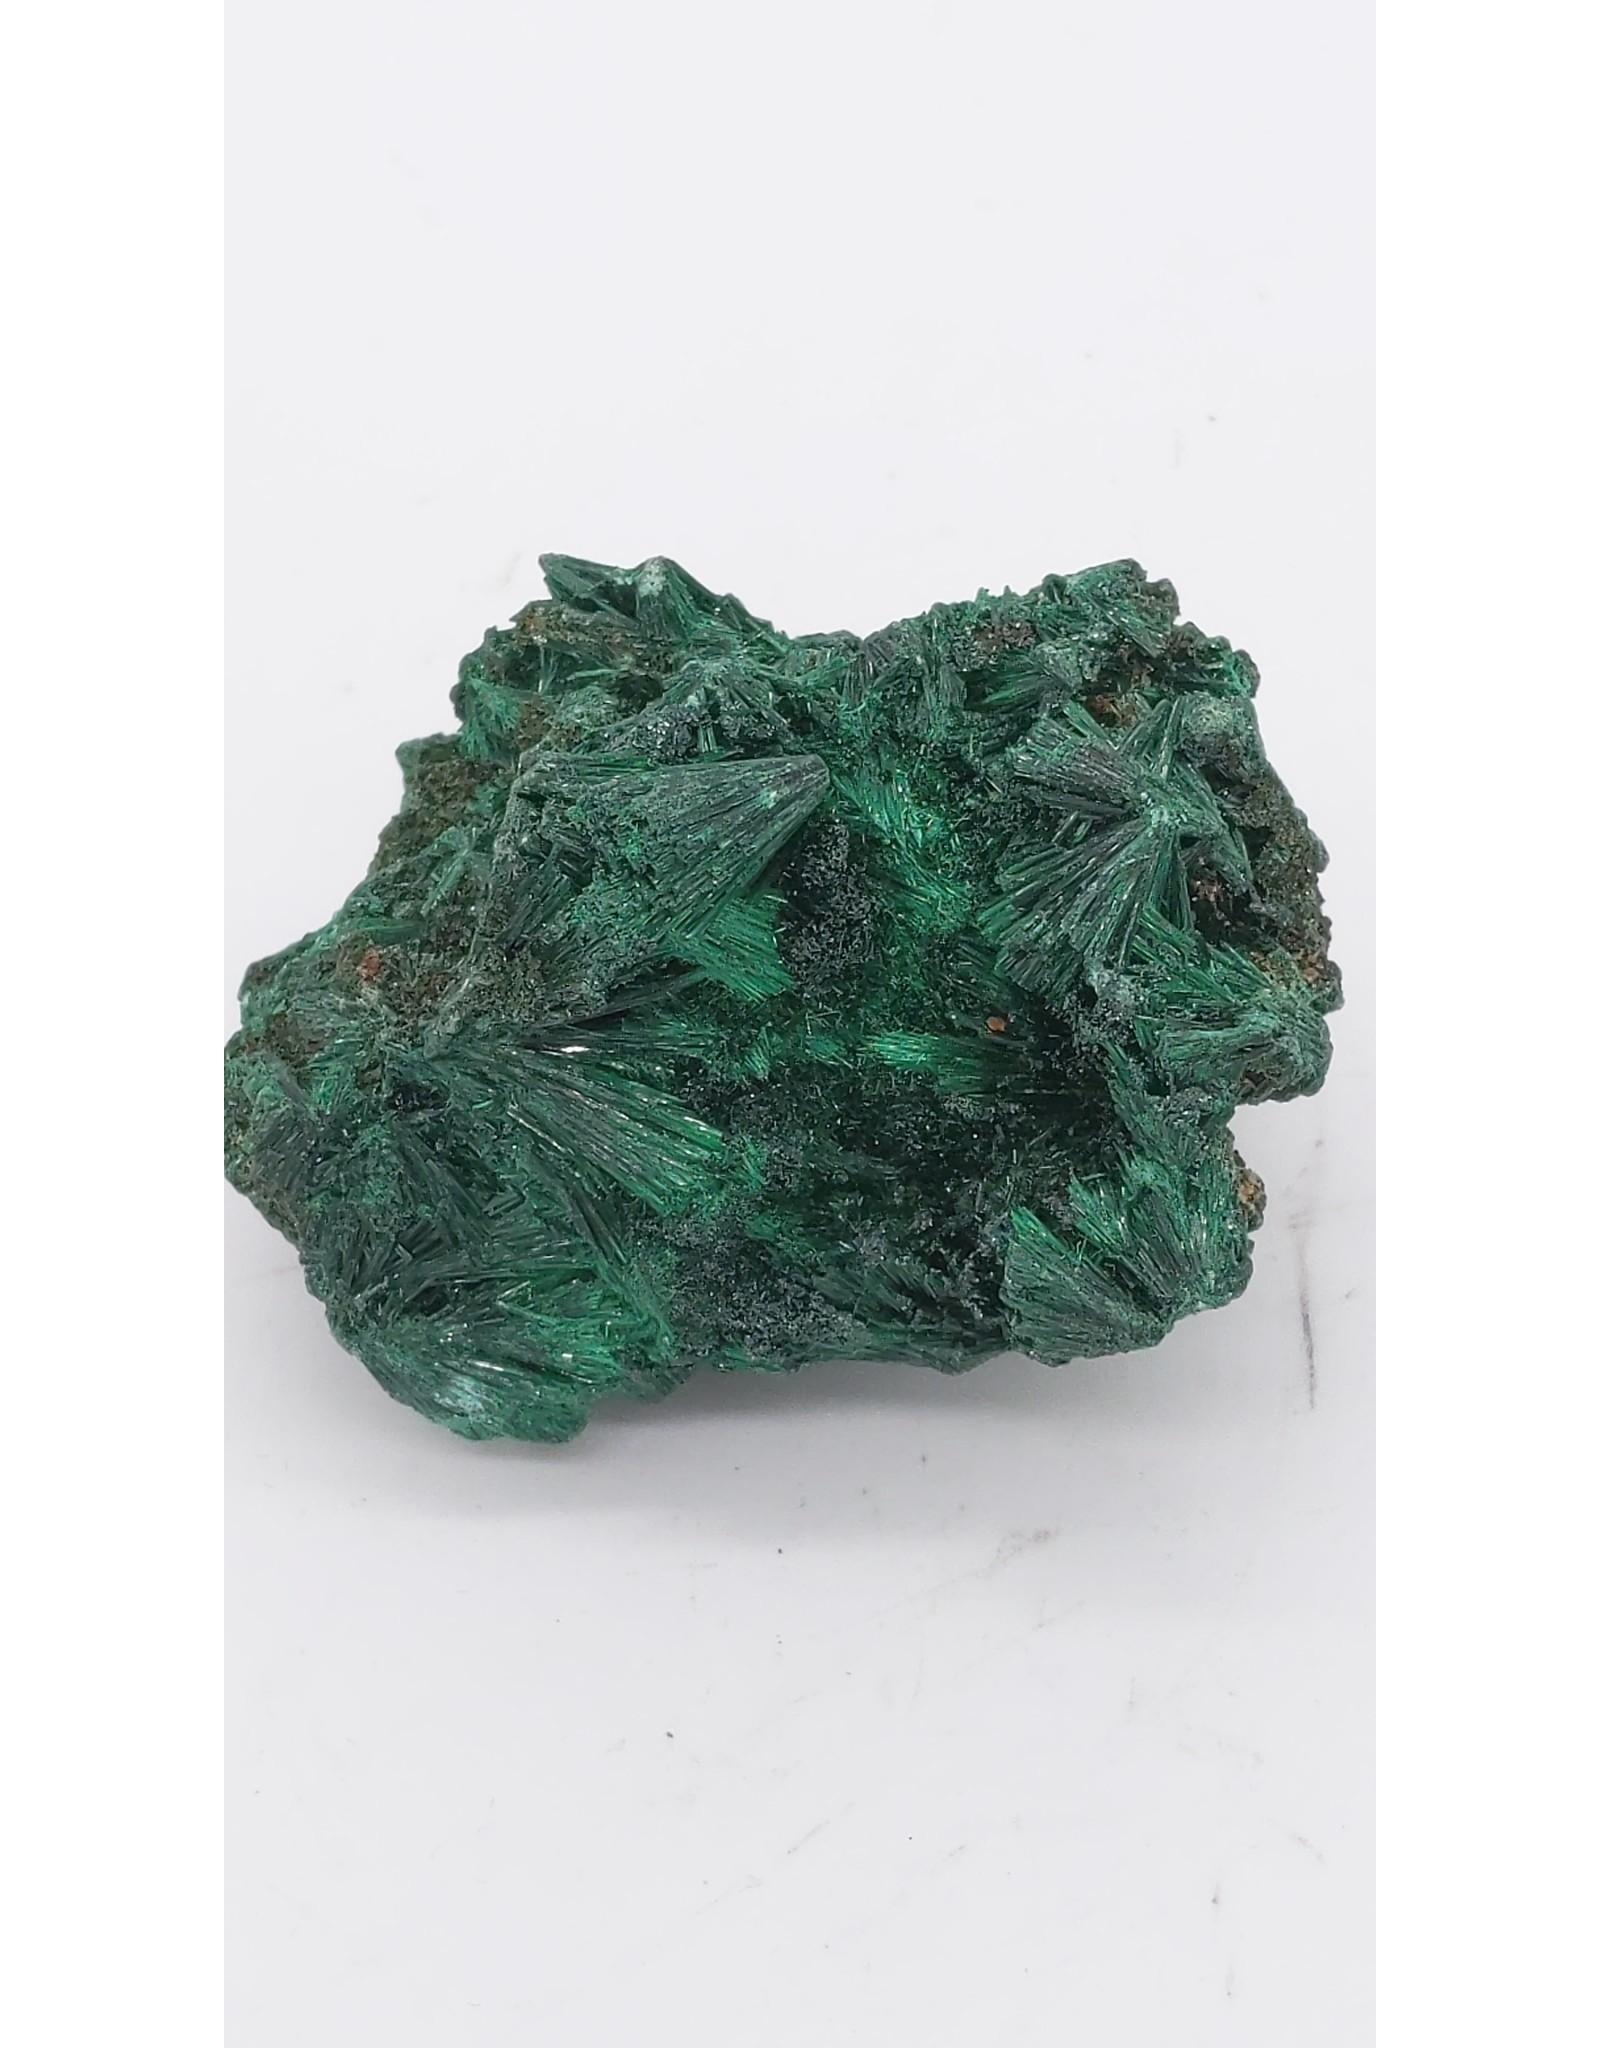 Fibrous Malachite (Congo) LARGE